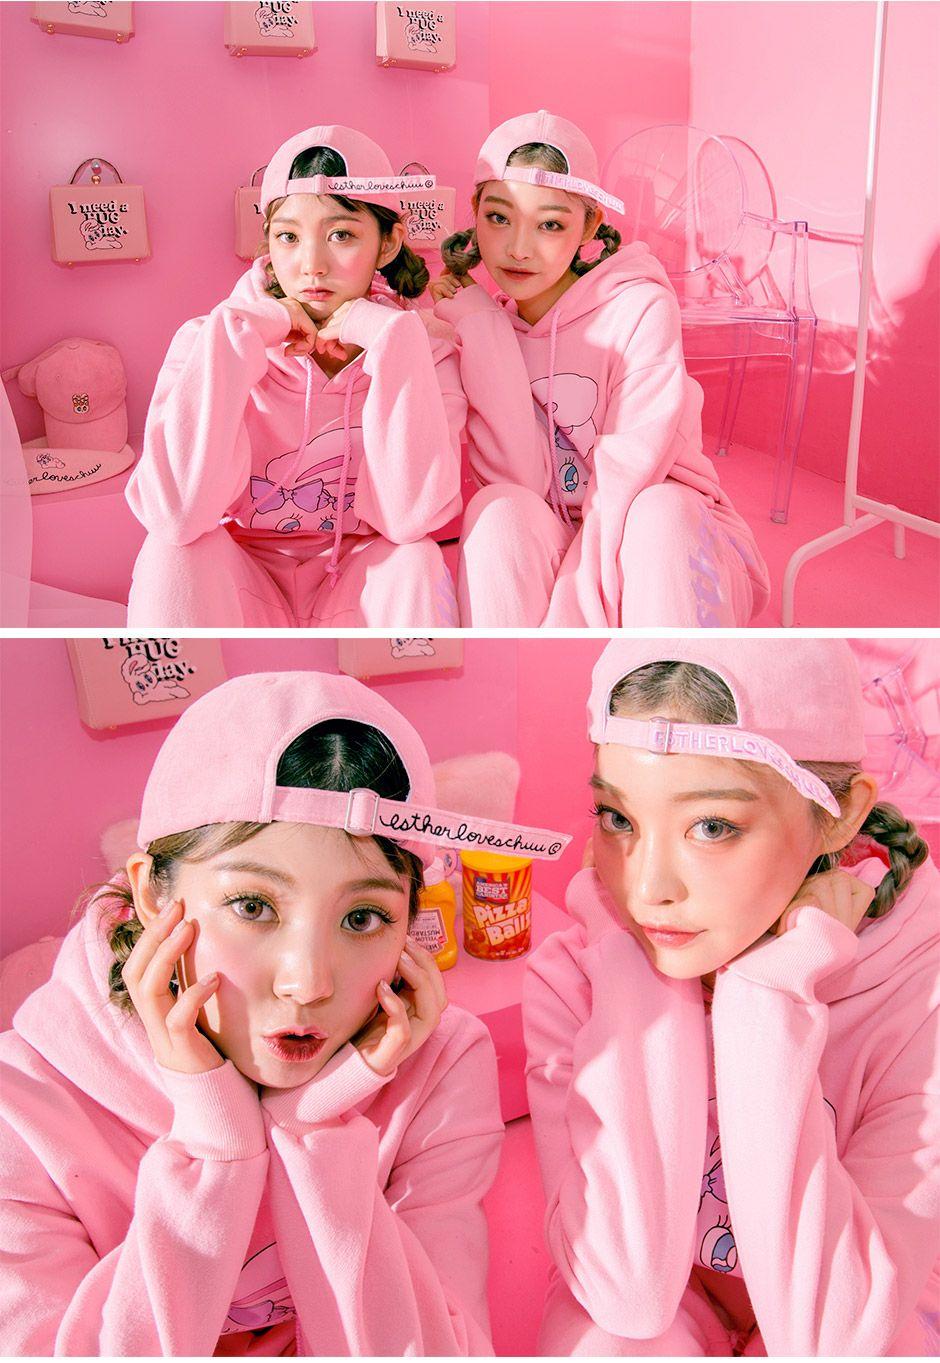 chuu_츄 - 츄(chuu) | Estherloveschuu home fur slipper | ♥esther loves chuu♥